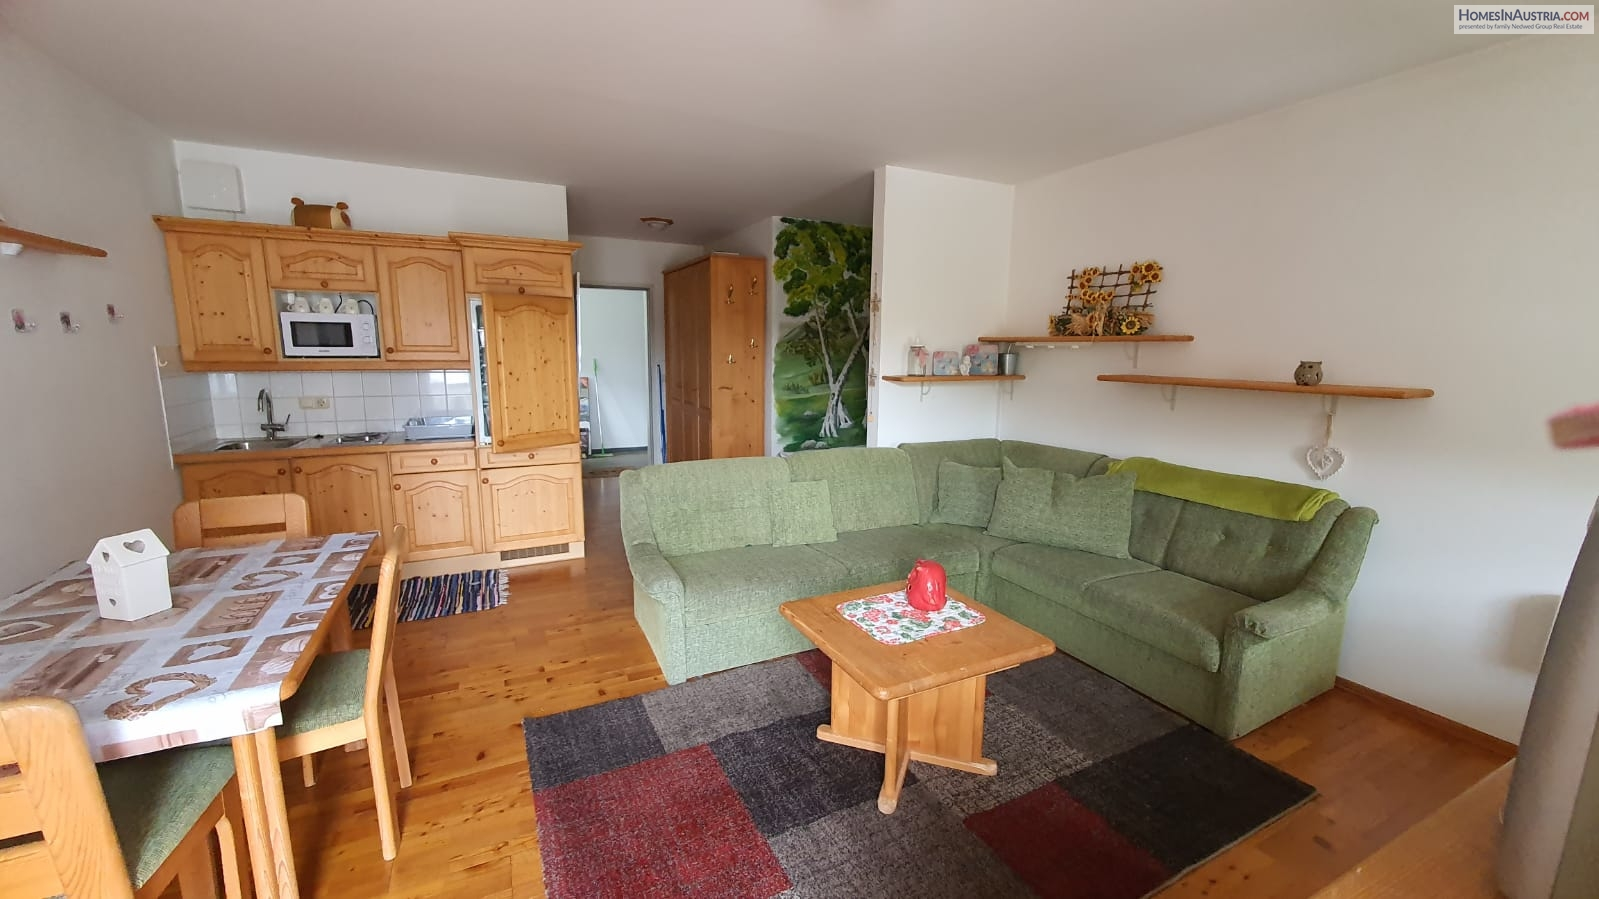 Nice small apartment near golf course and Bad Kleinkirchheim, Carinthia